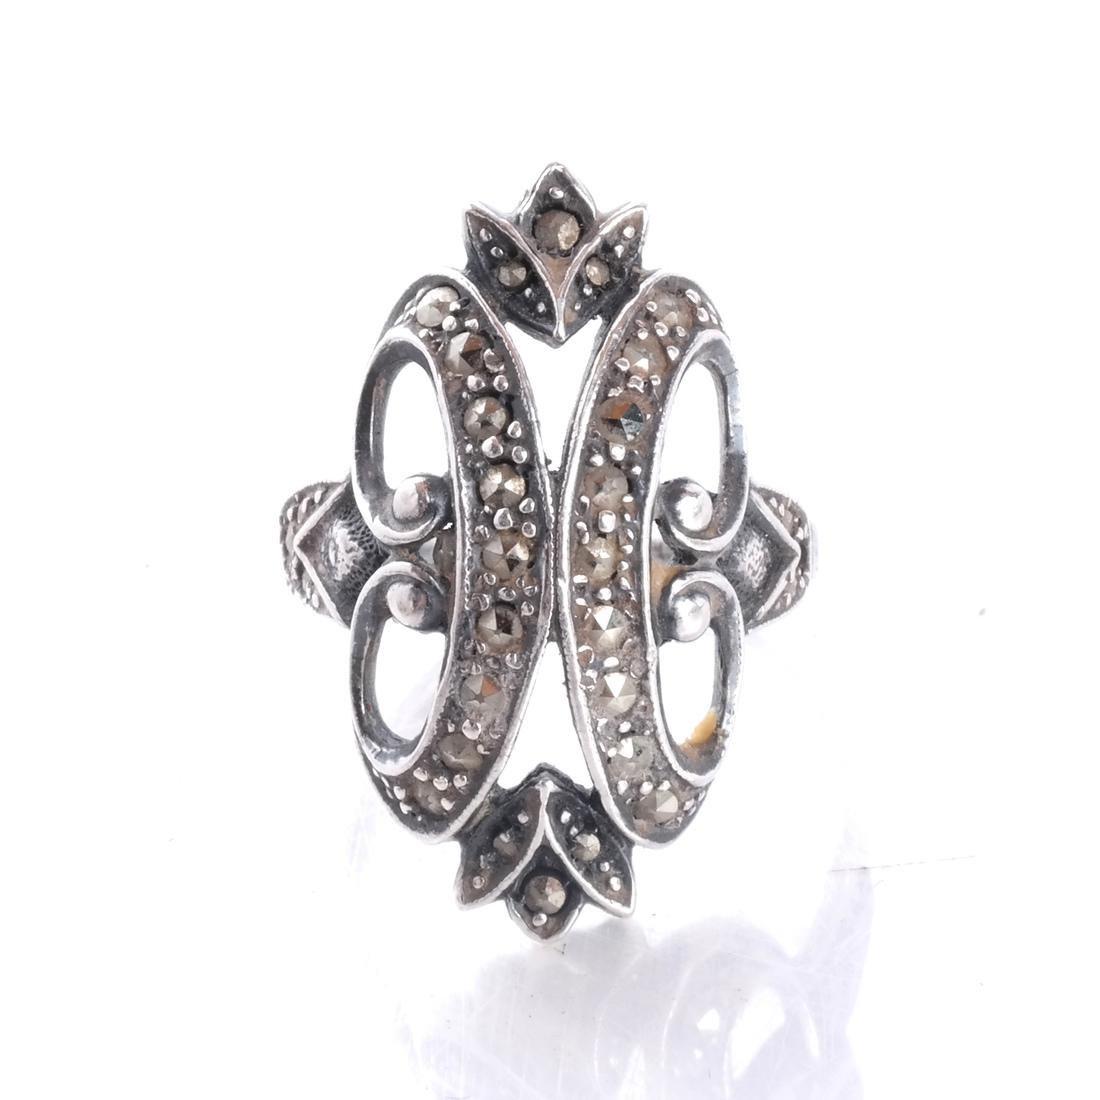 .925 Sterling Silver & Diamond Ring